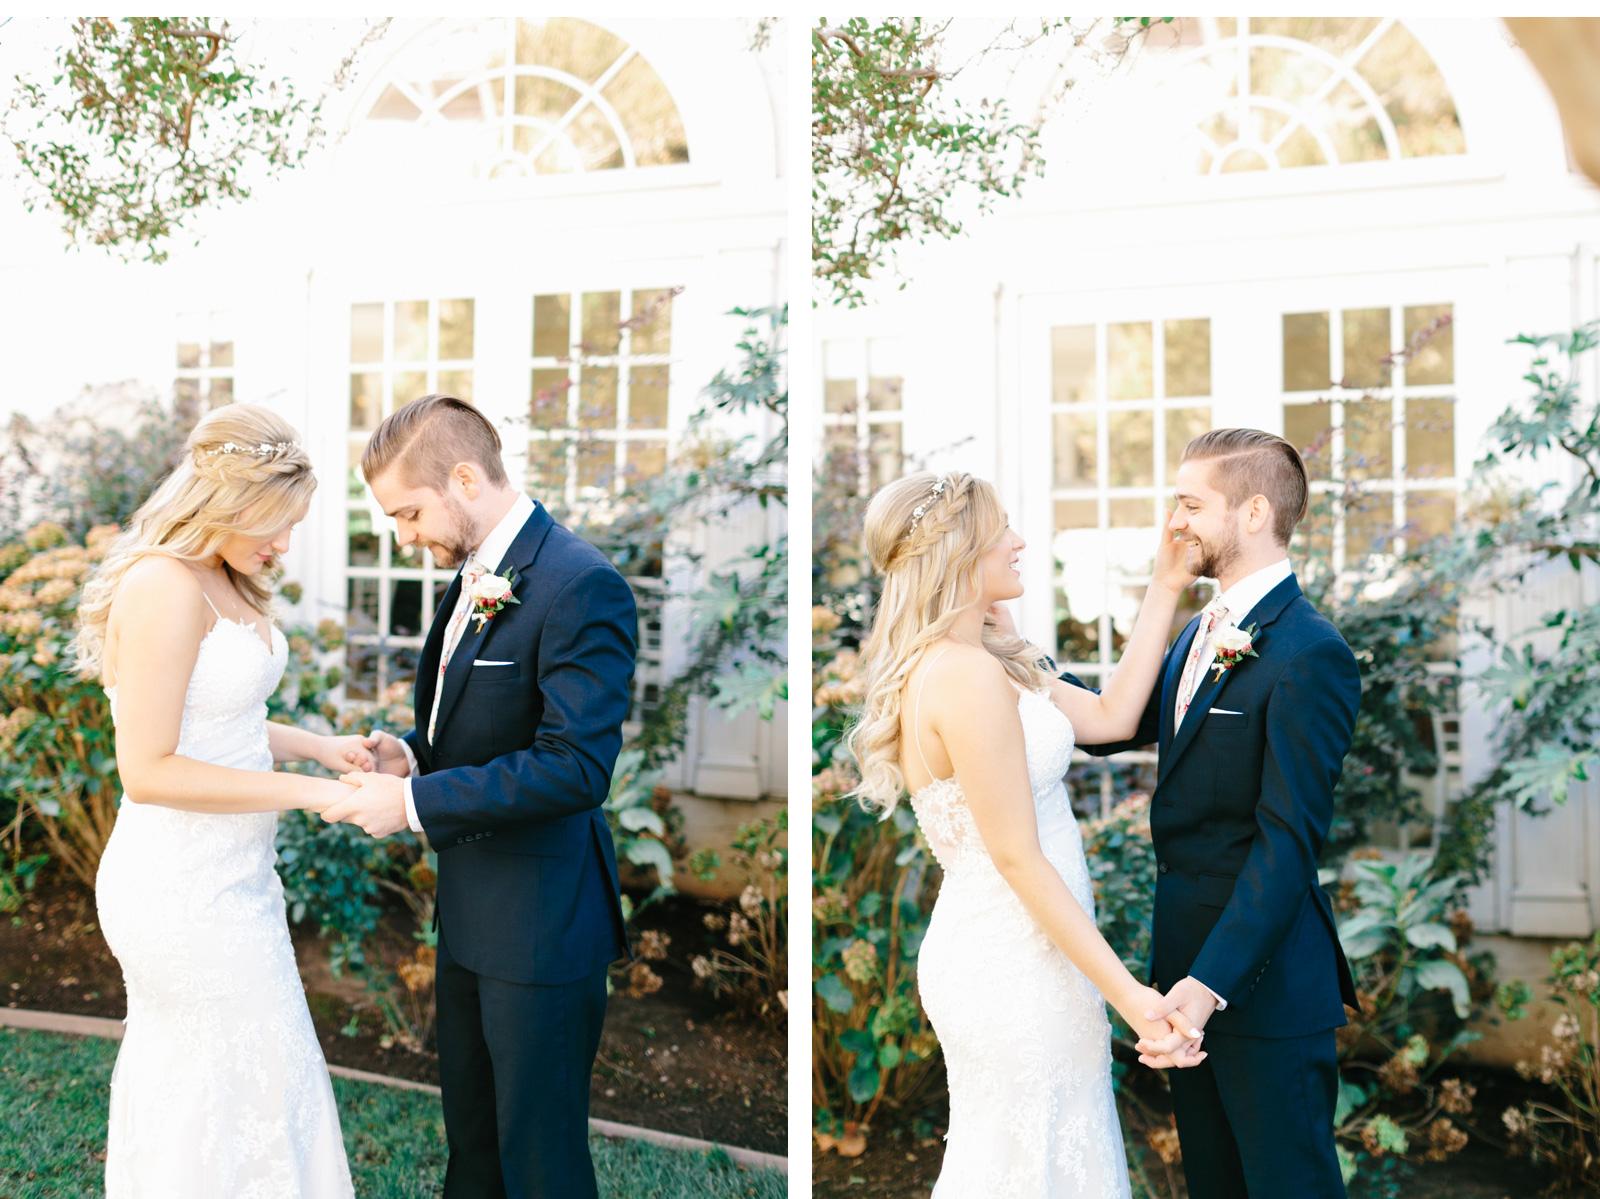 Malibu-Wedding-Photographer-Natalie-Schutt-Photography-Vizcaya_02.jpg